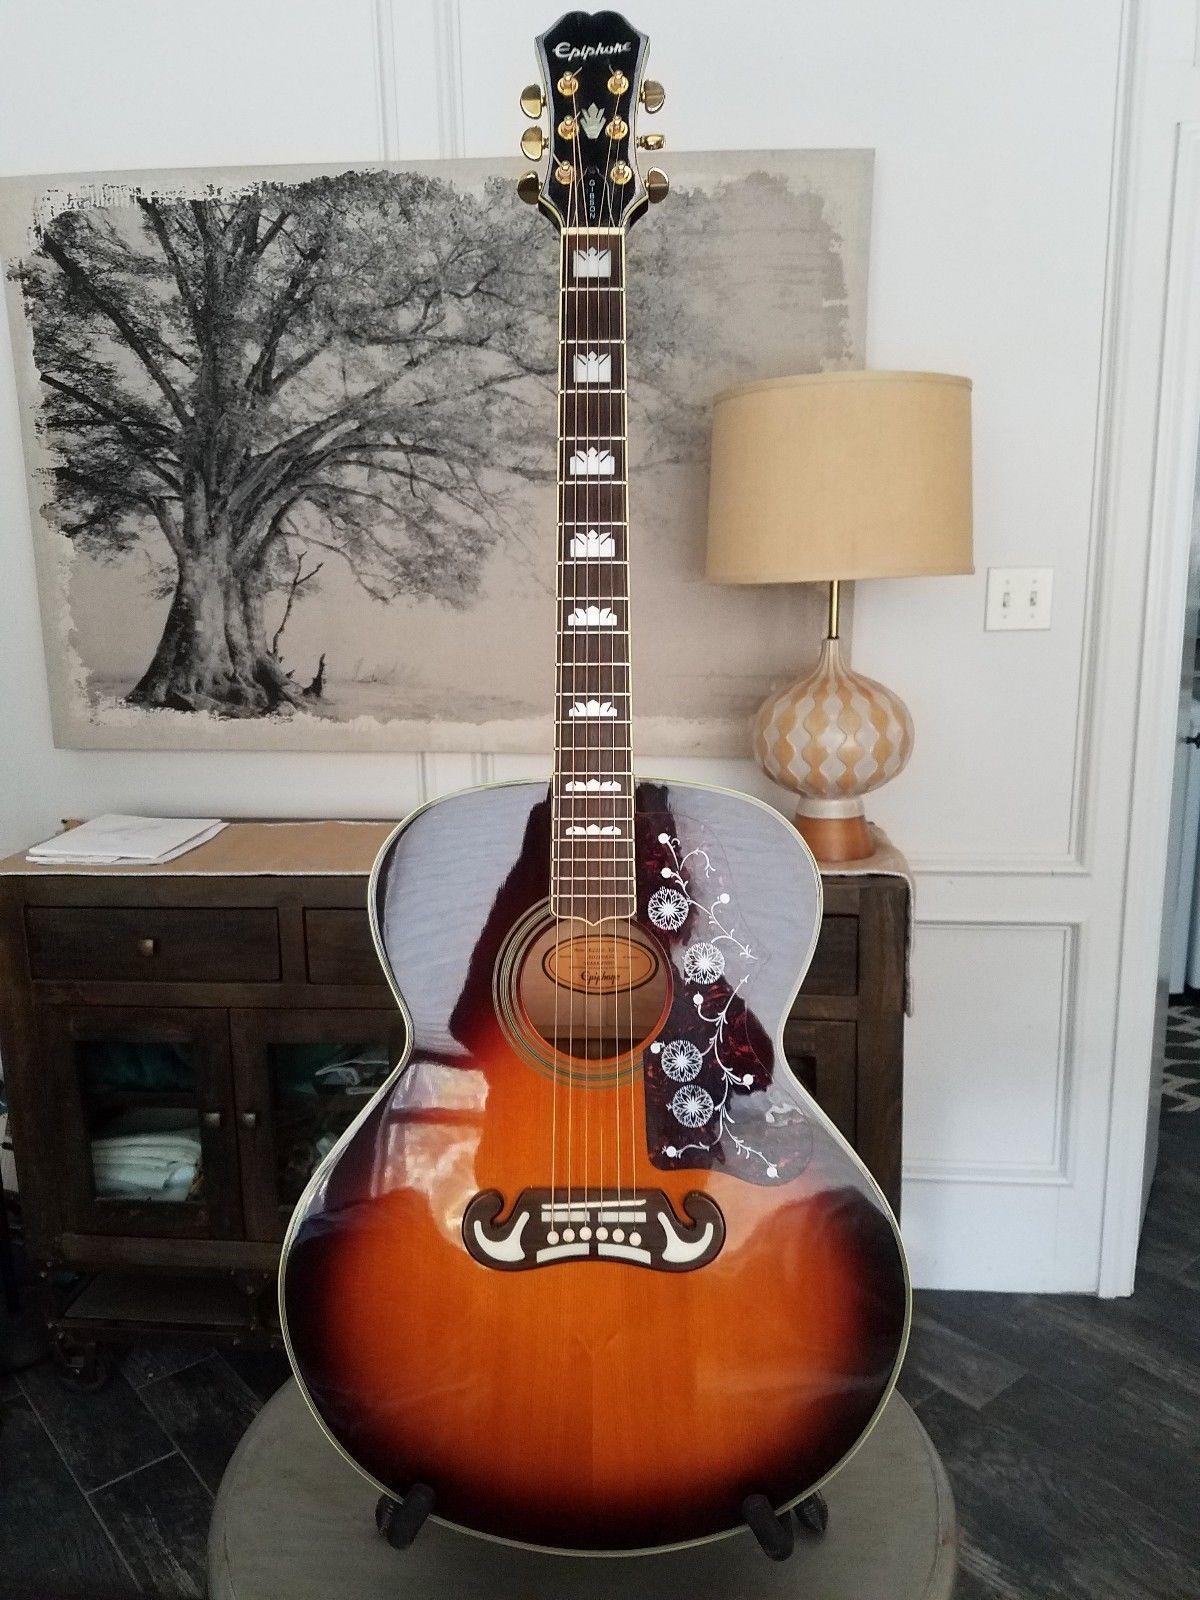 Guitar Epiphone Gibson Ej200 Vs Jumbo Sunburst Acoustic Guitar Excellent Please Retweet Guitar Acoustic Guitar Epiphone